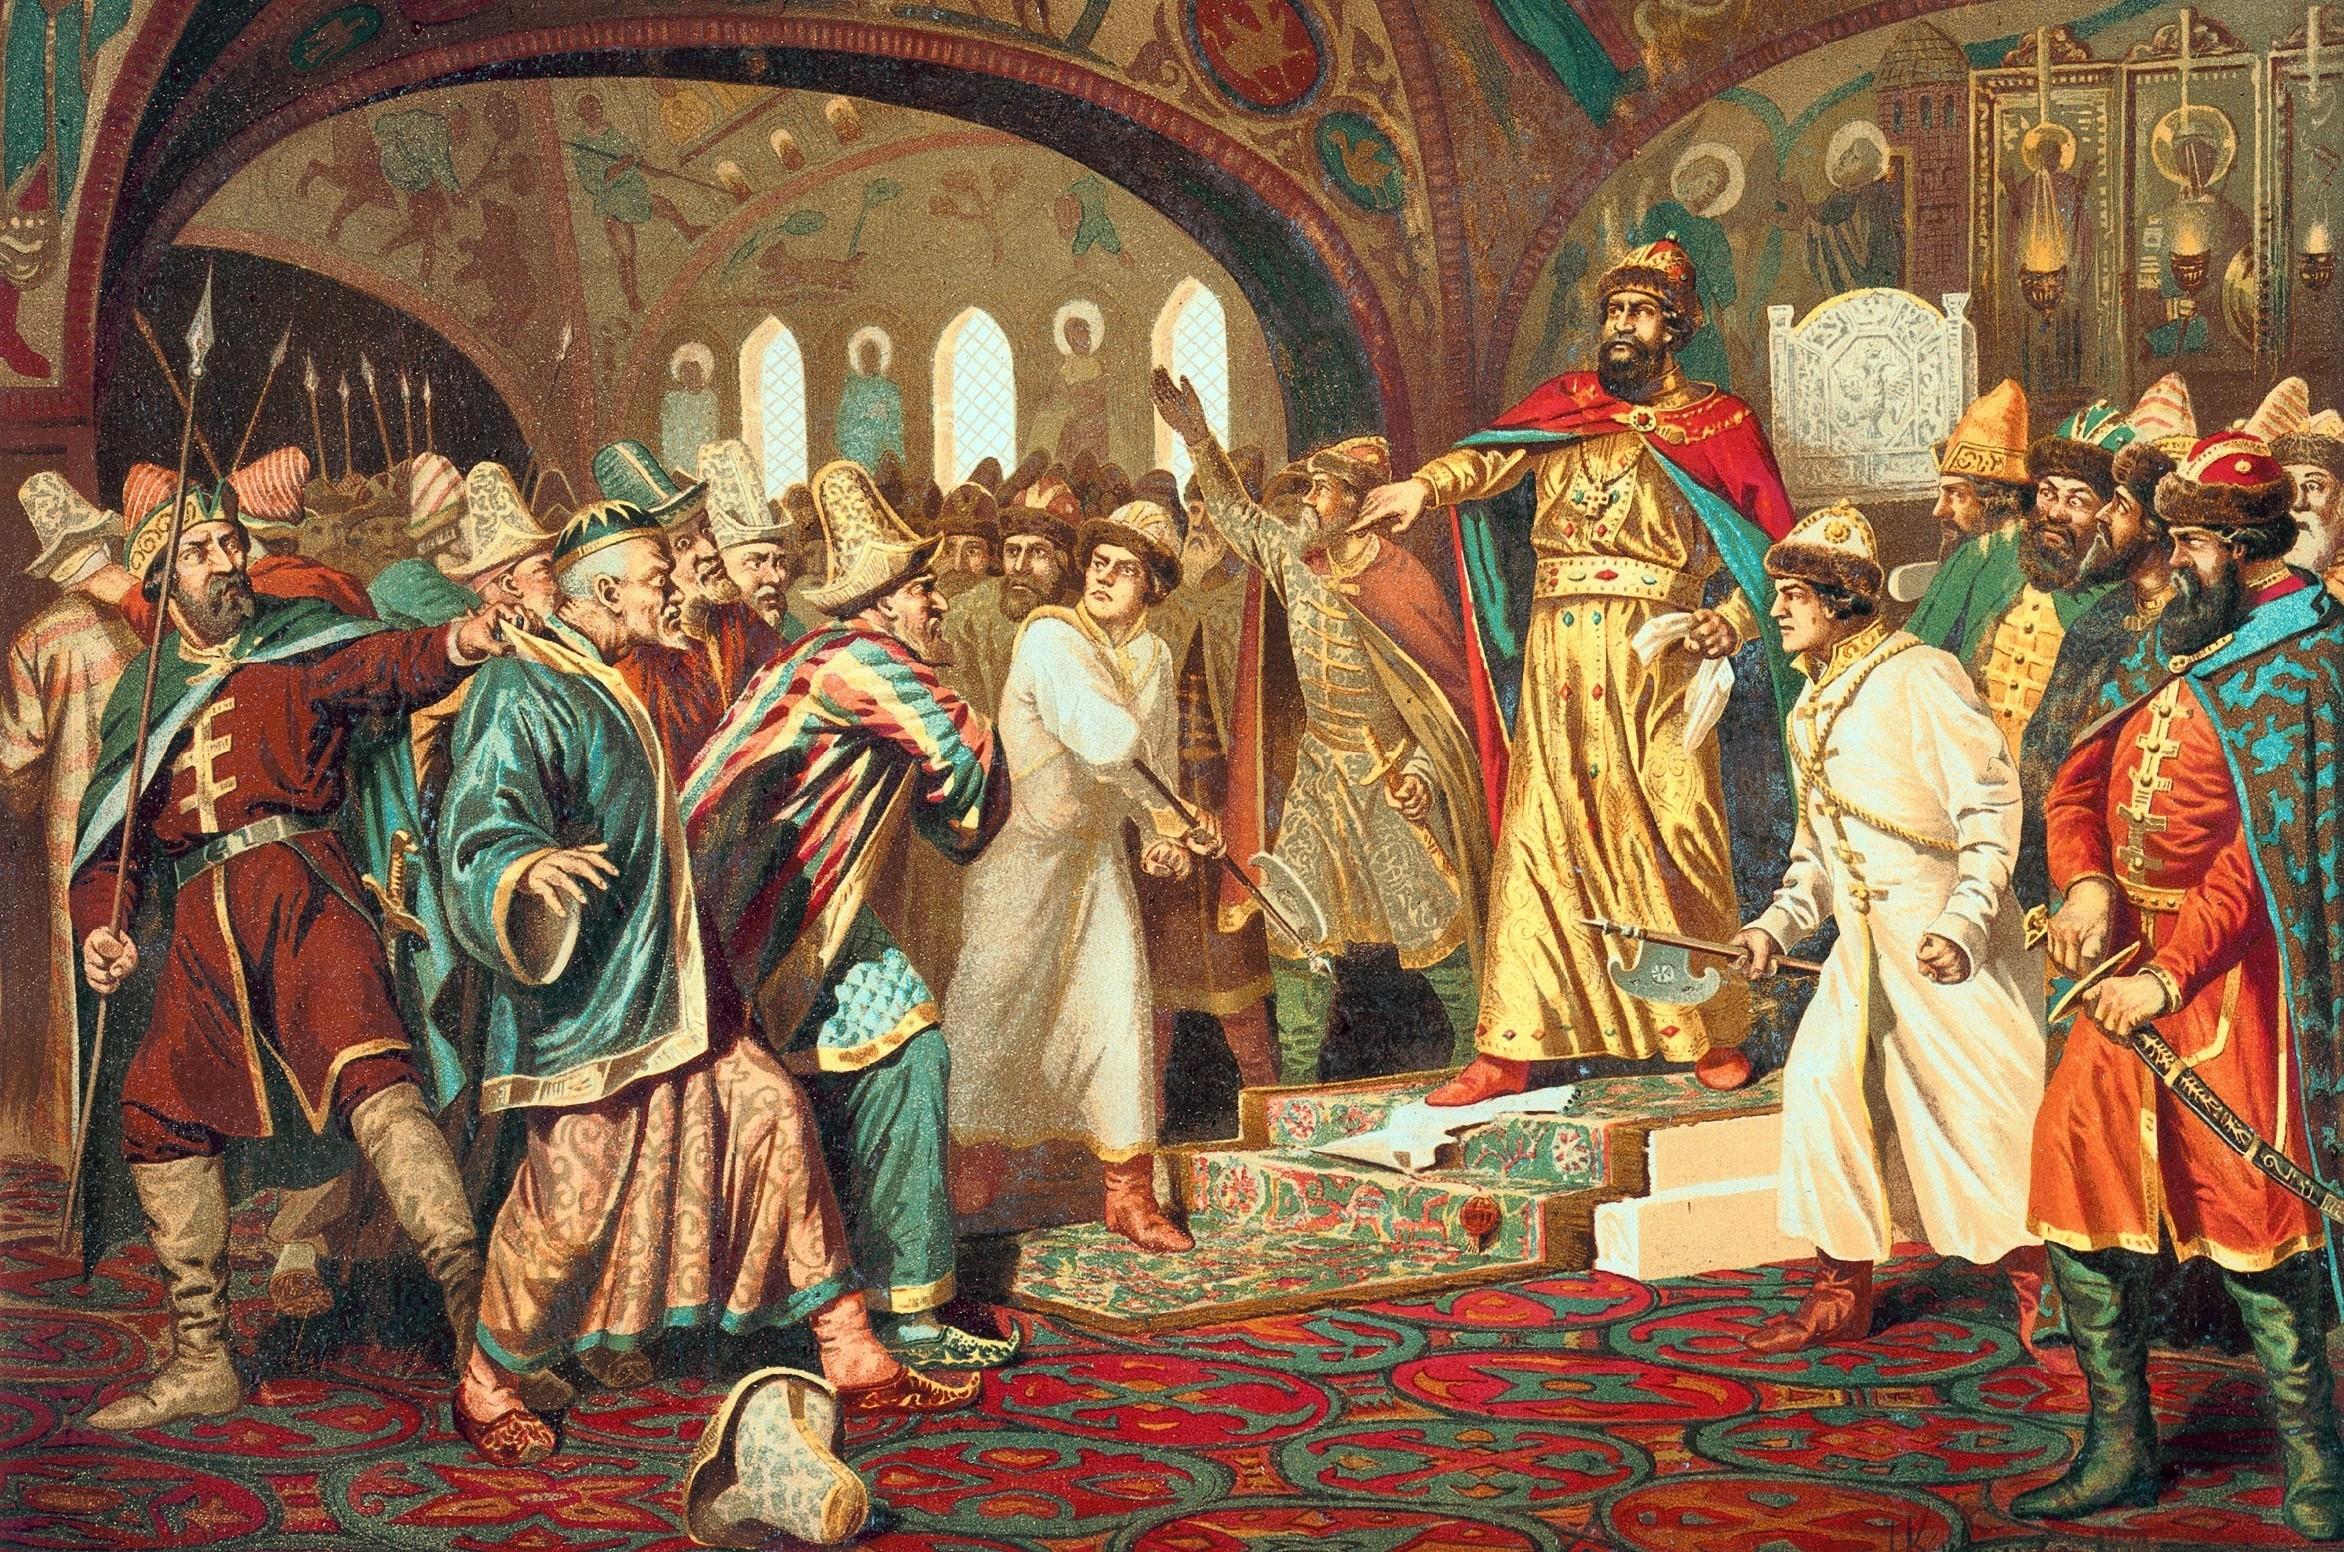 """Кнез Иван III цепа каново писмо на комаде"", Алексеј Кившенко, 1897."